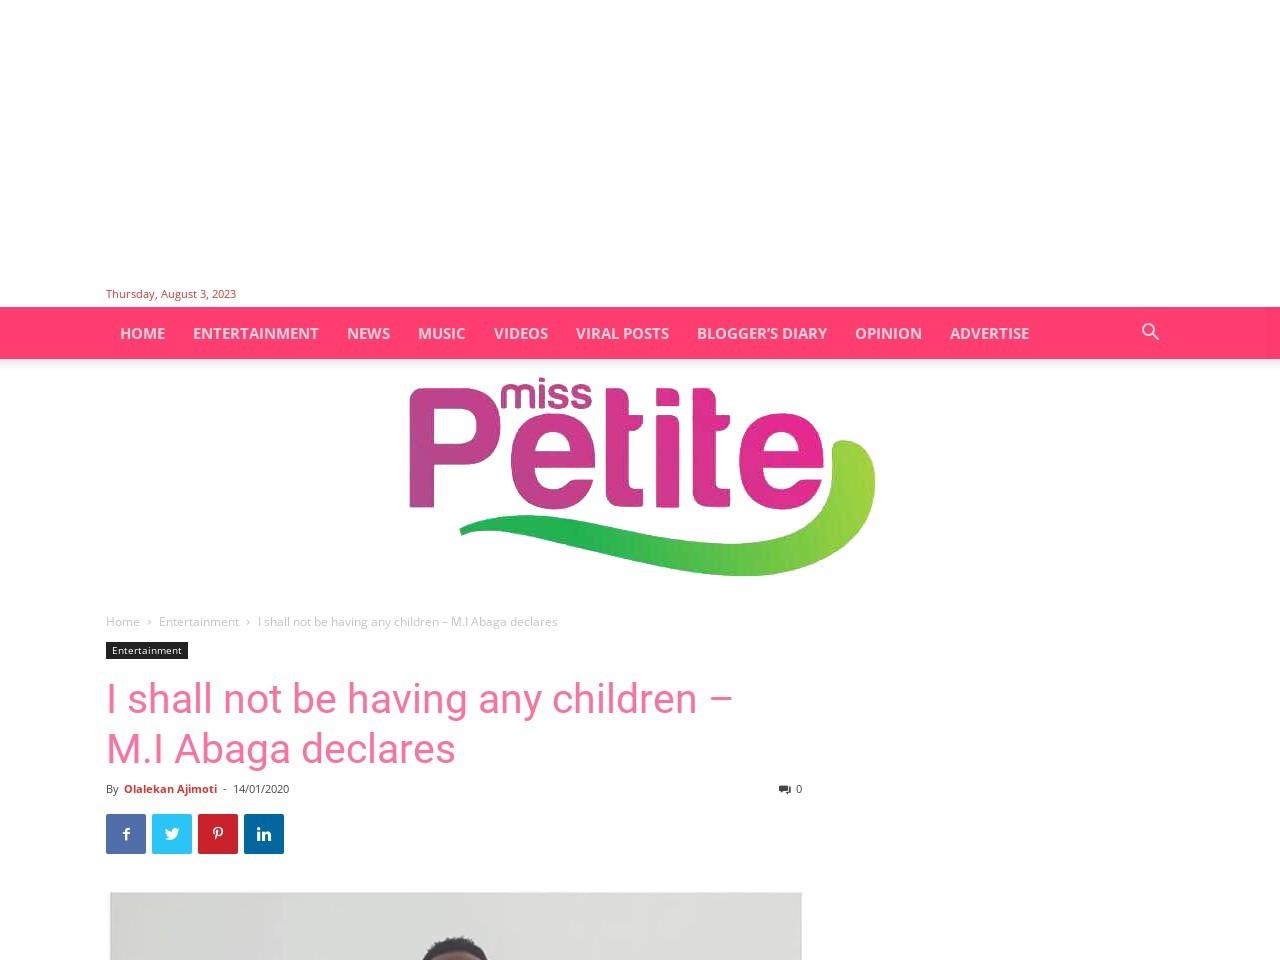 I shall not be having any children – M.I Abaga declares